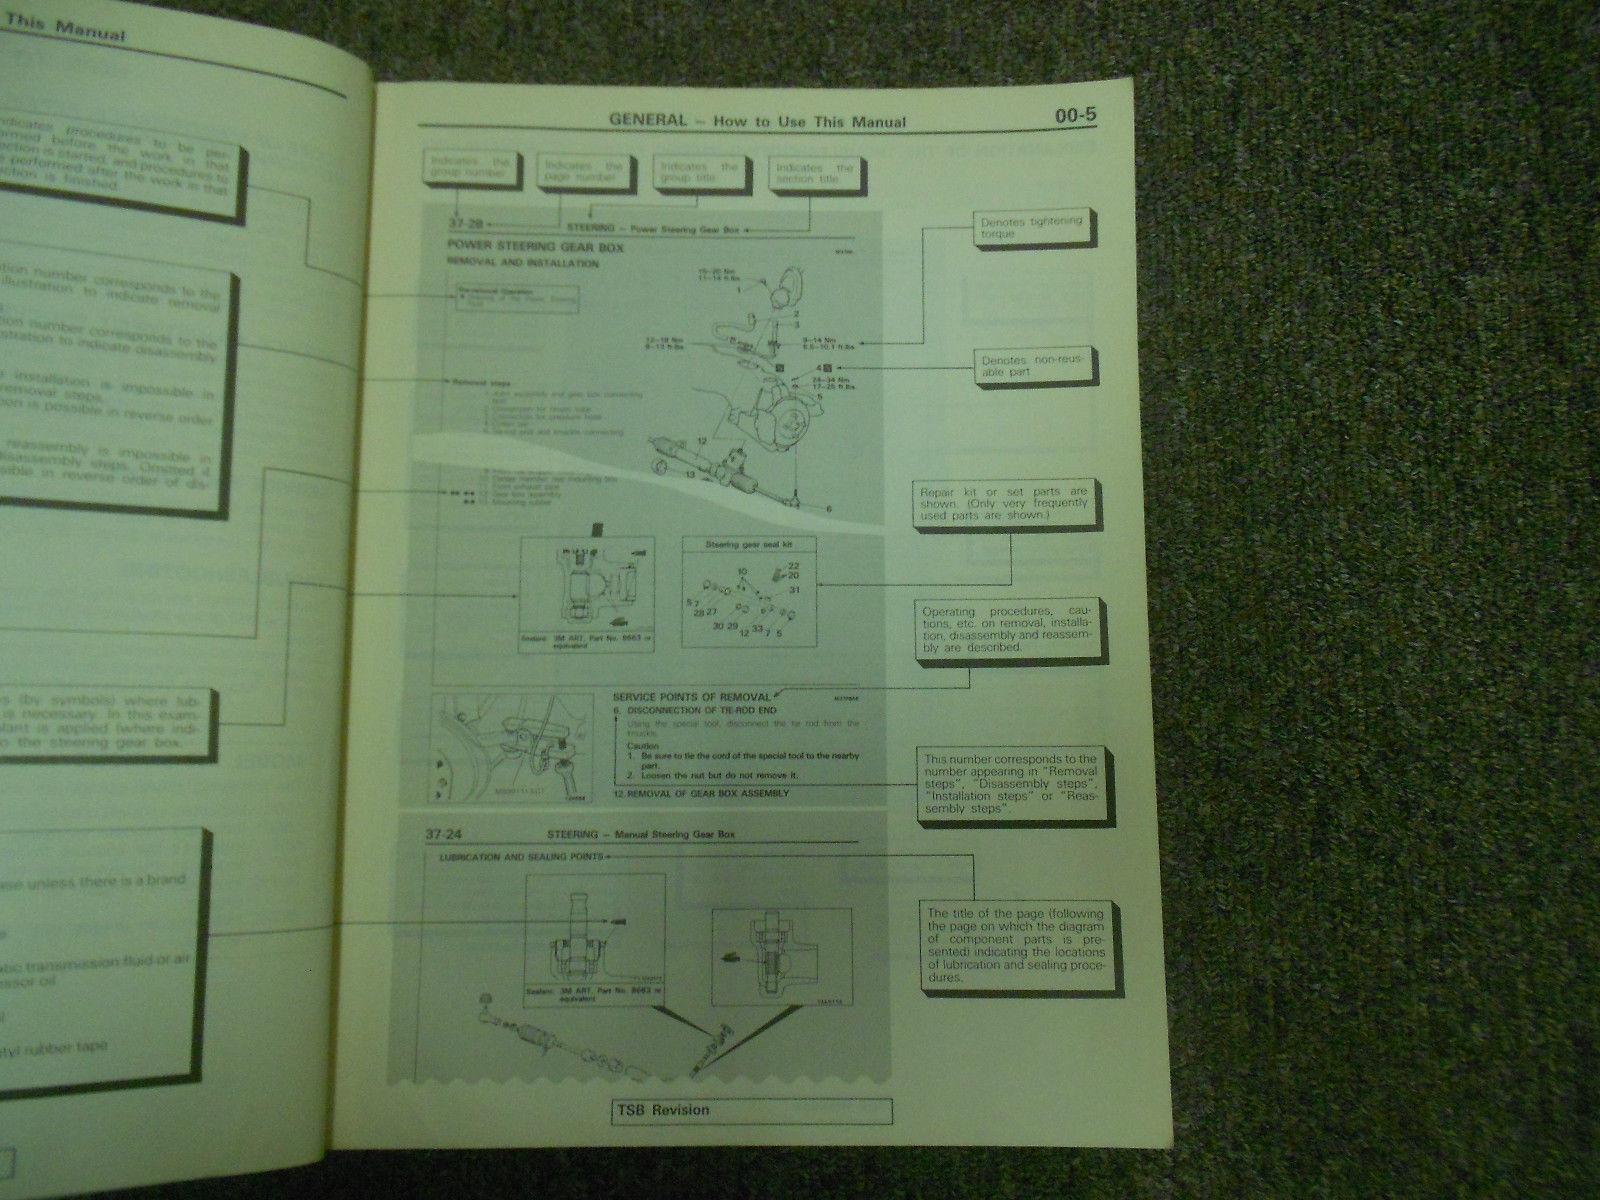 1992 MITSUBISHI Mirage Service Repair Shop Manual Volume 1 Chassis Body OEM 92